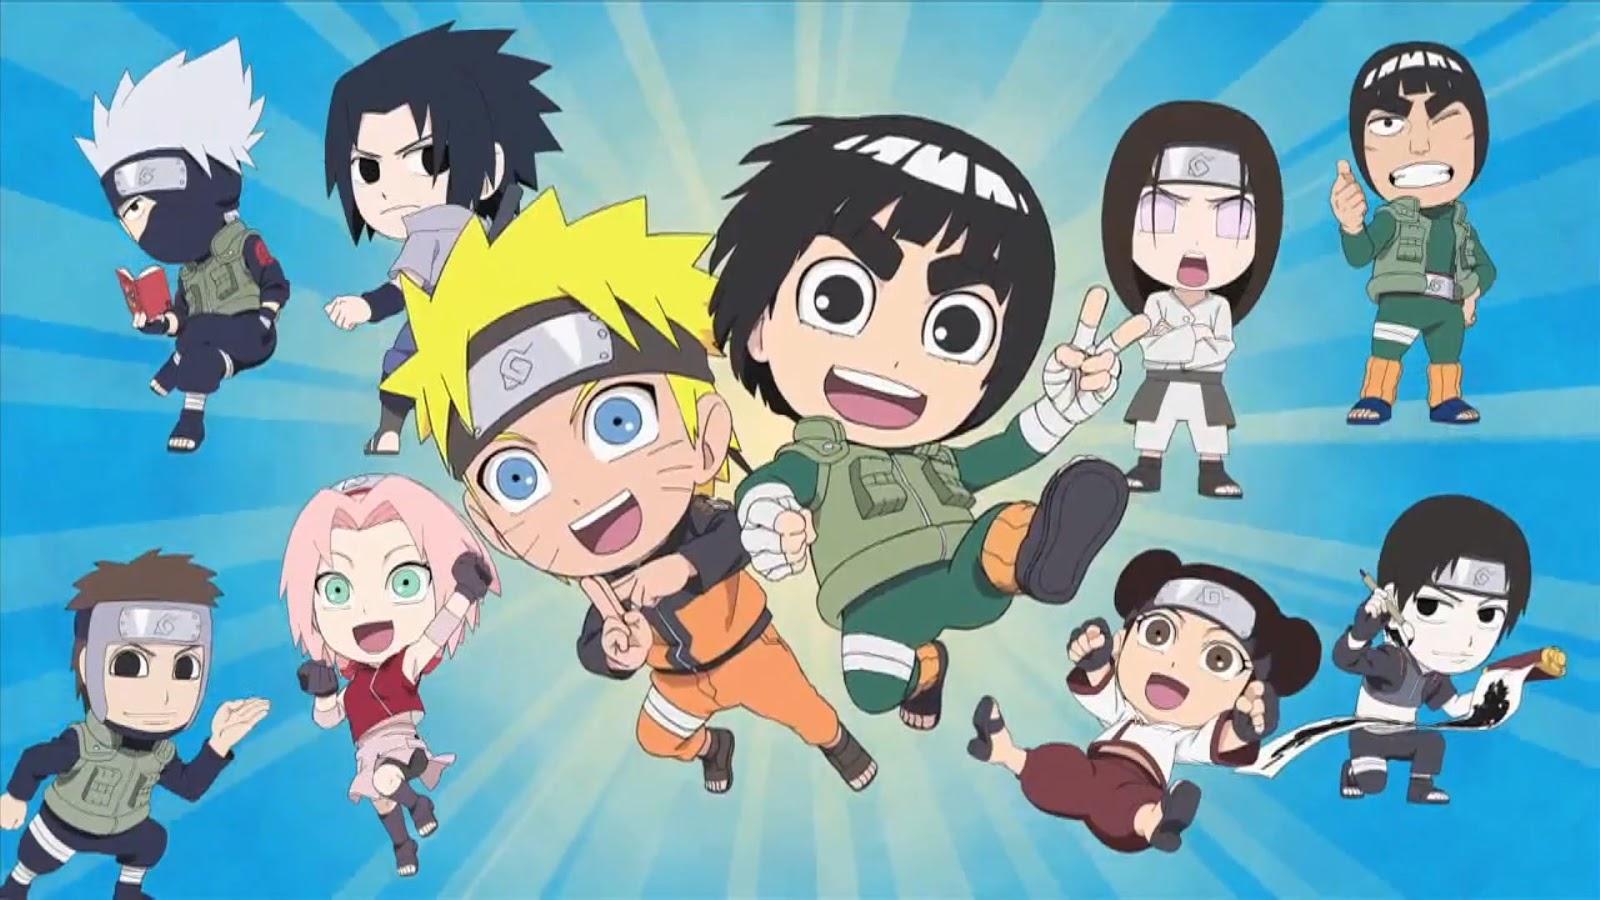 Download 66+ Gambar Lucu Kartun Naruto Paling Lucu